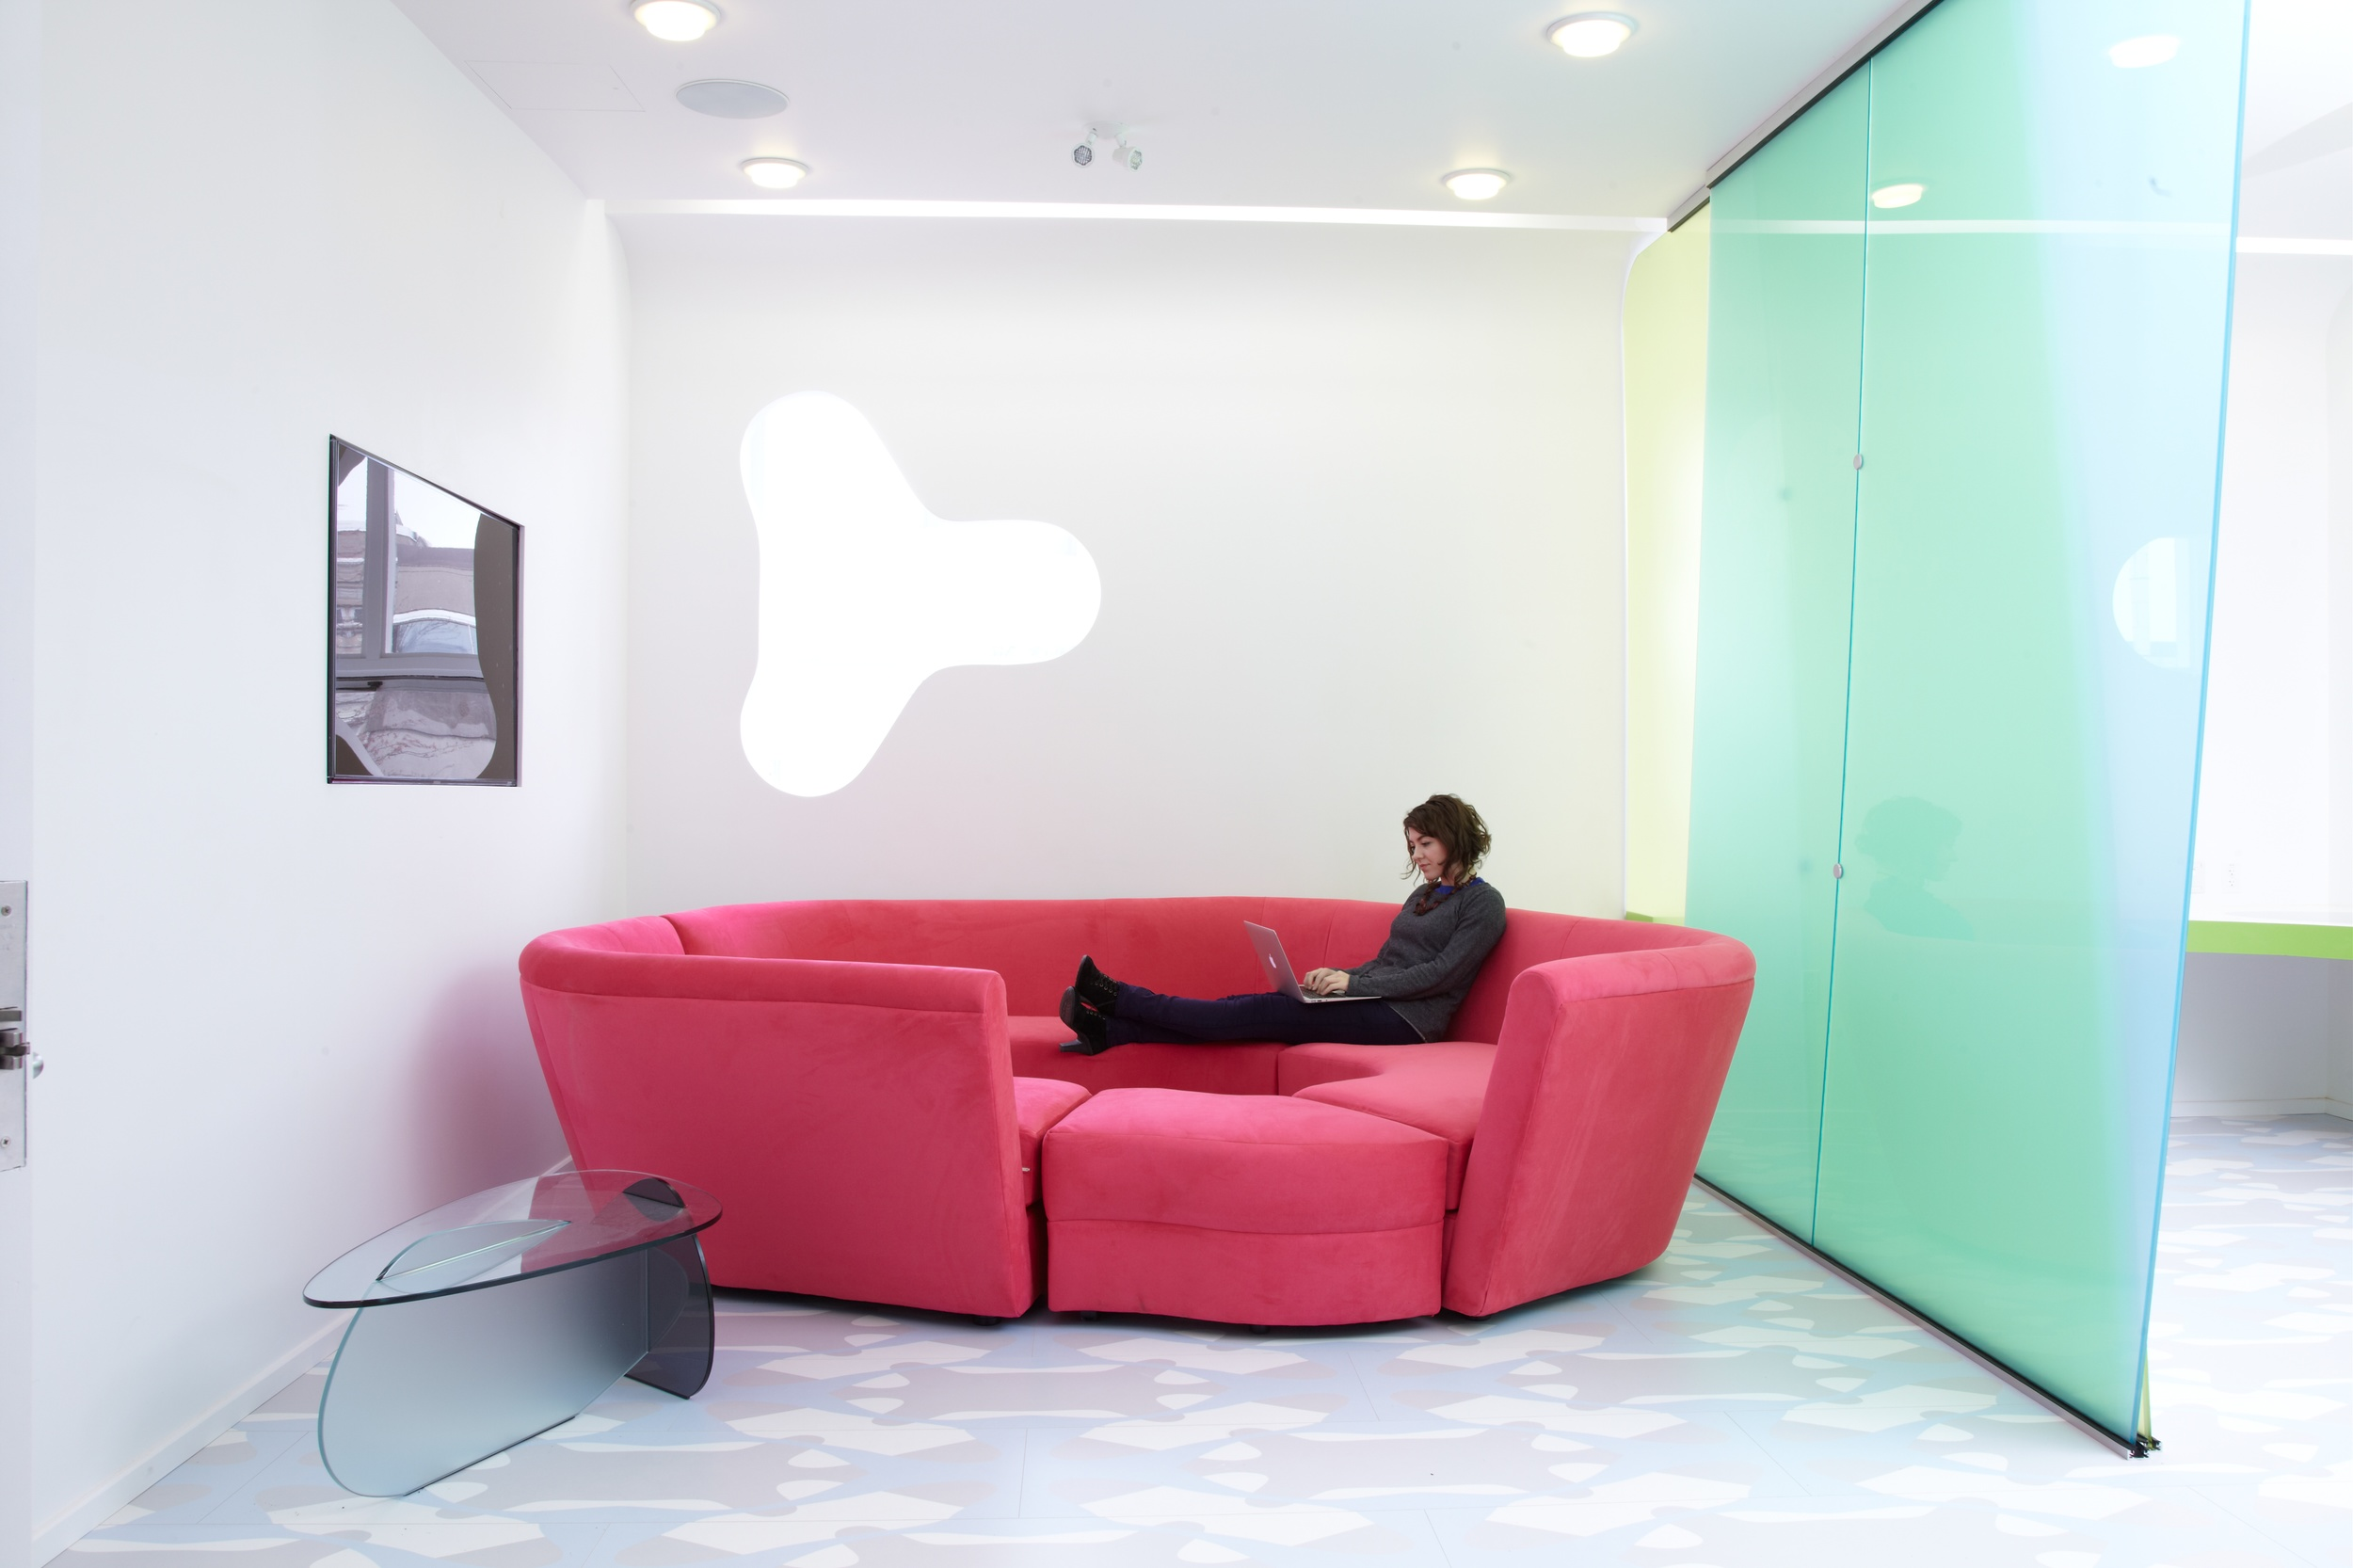 Queens opens the first ever boutique laboratory designed by award winning global designer karim rashid human media lab